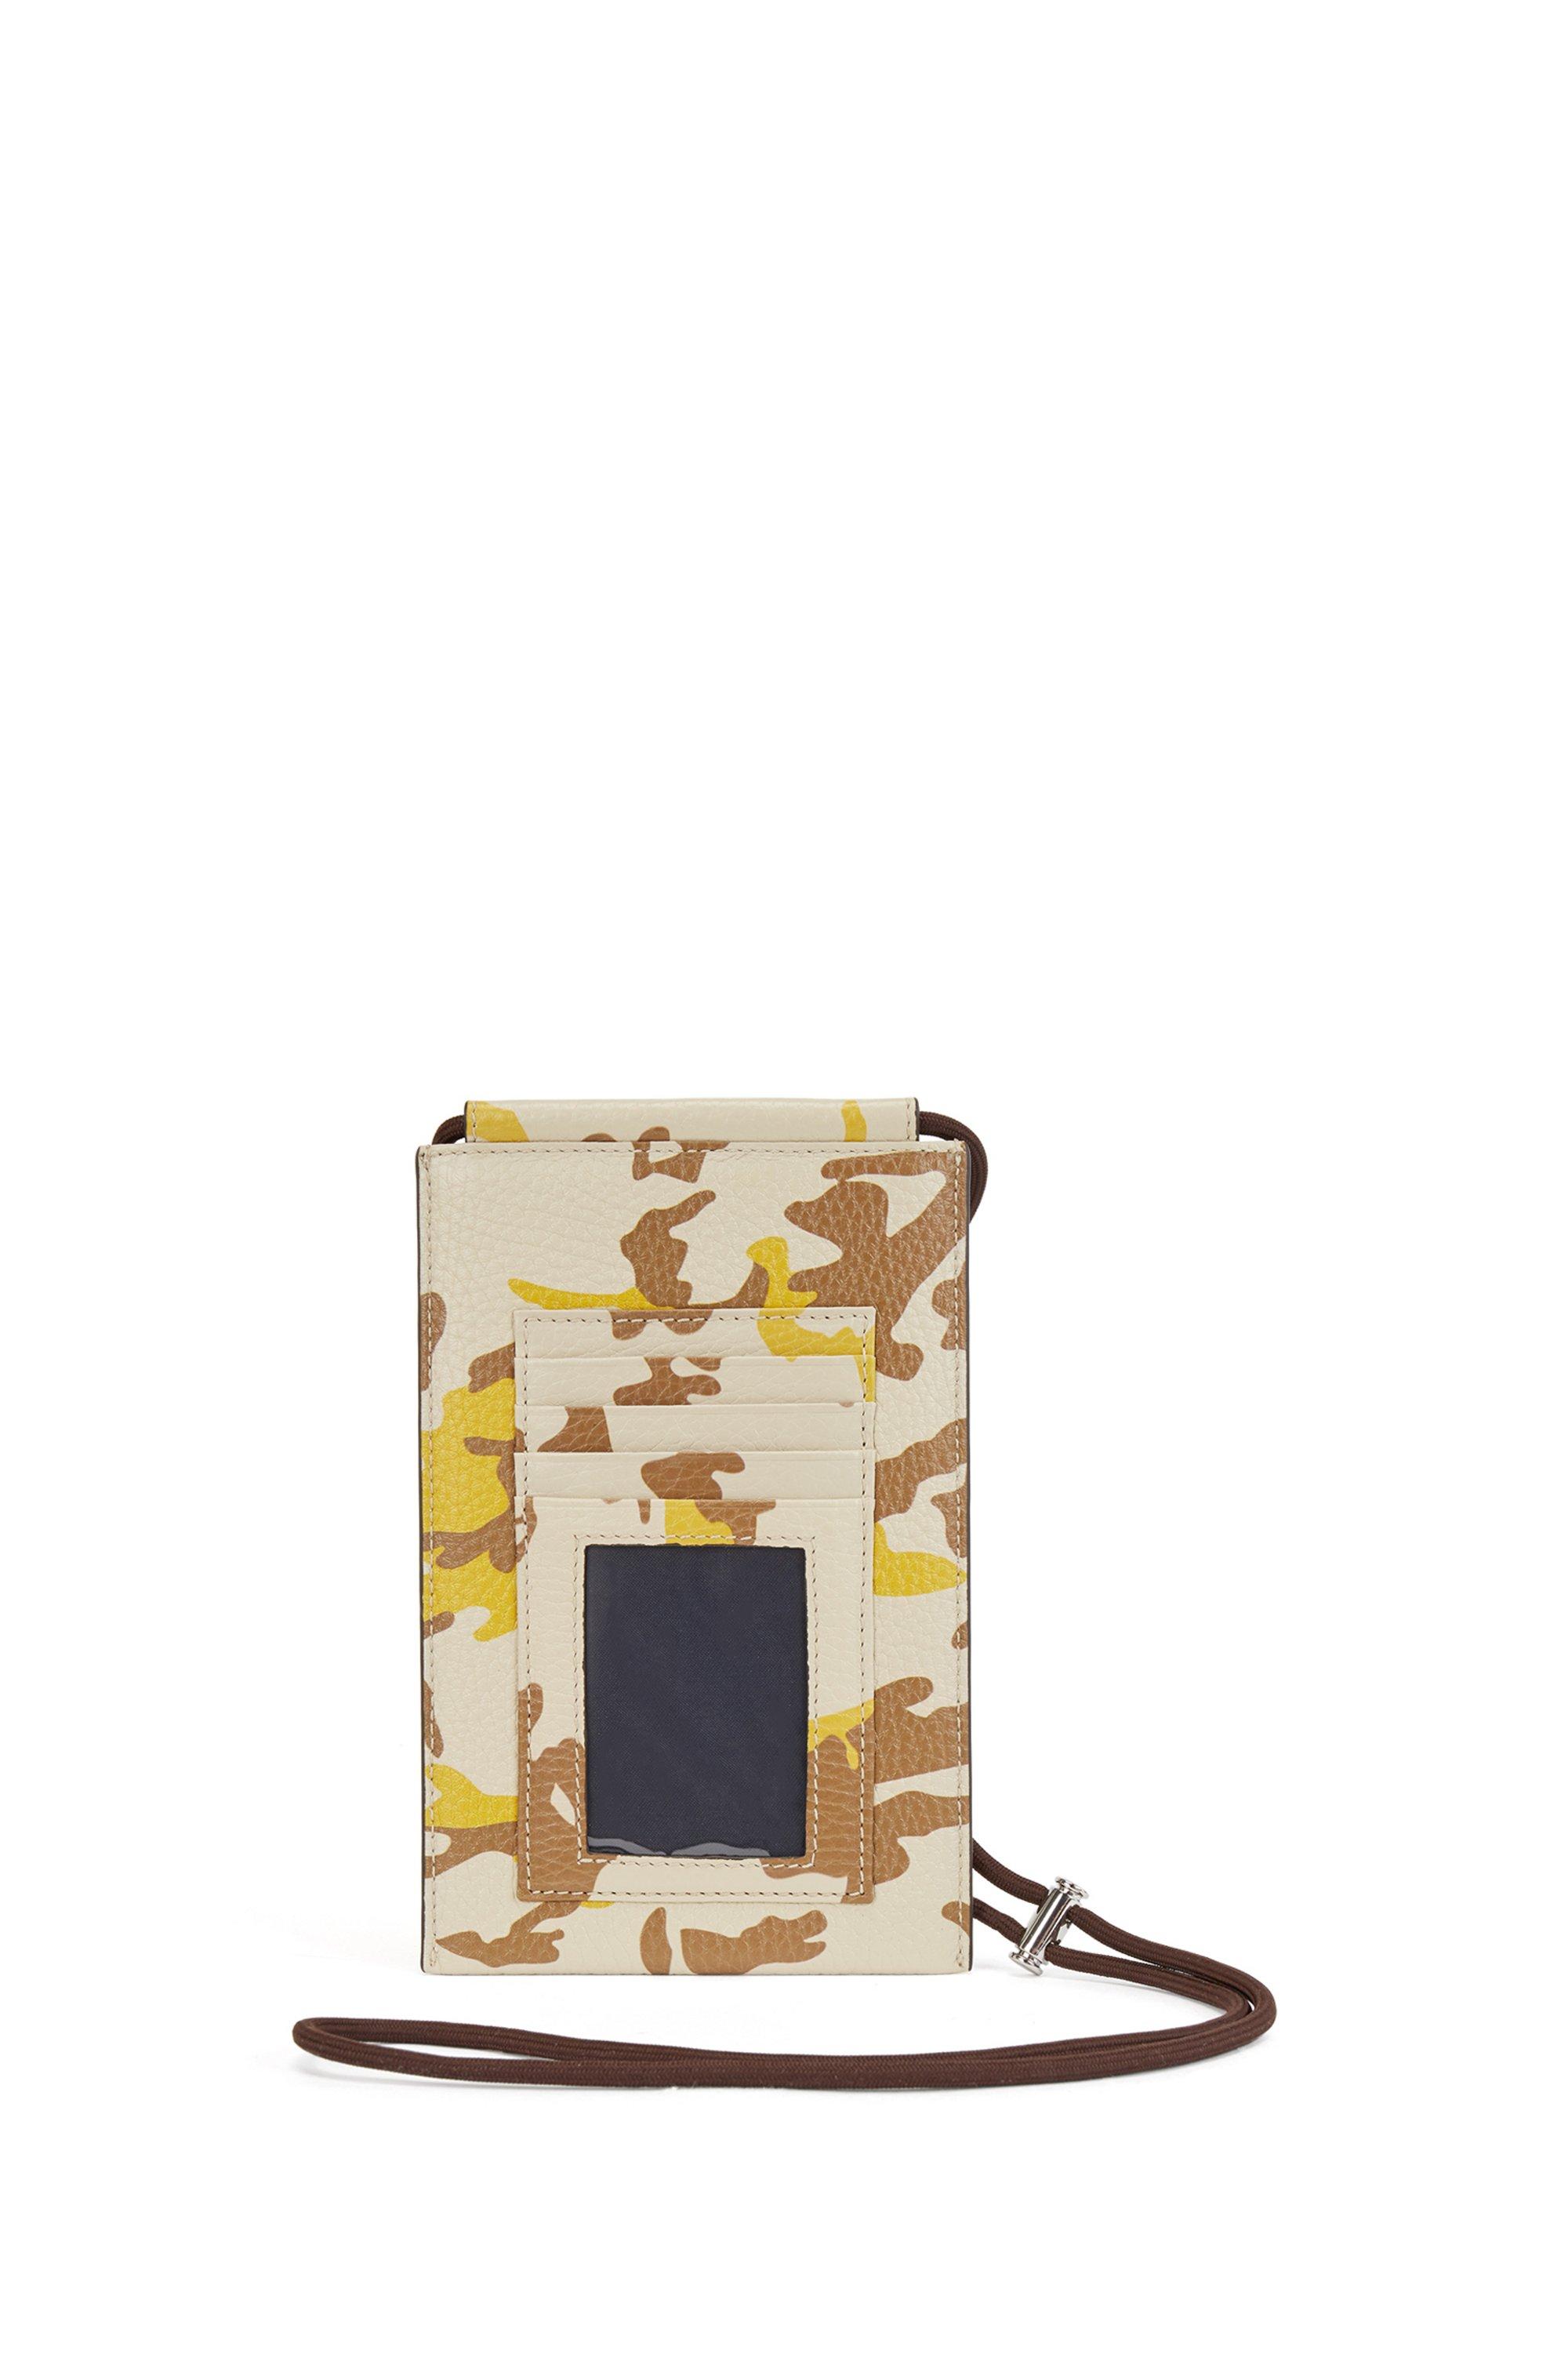 Camouflage-print organiser in Italian leather